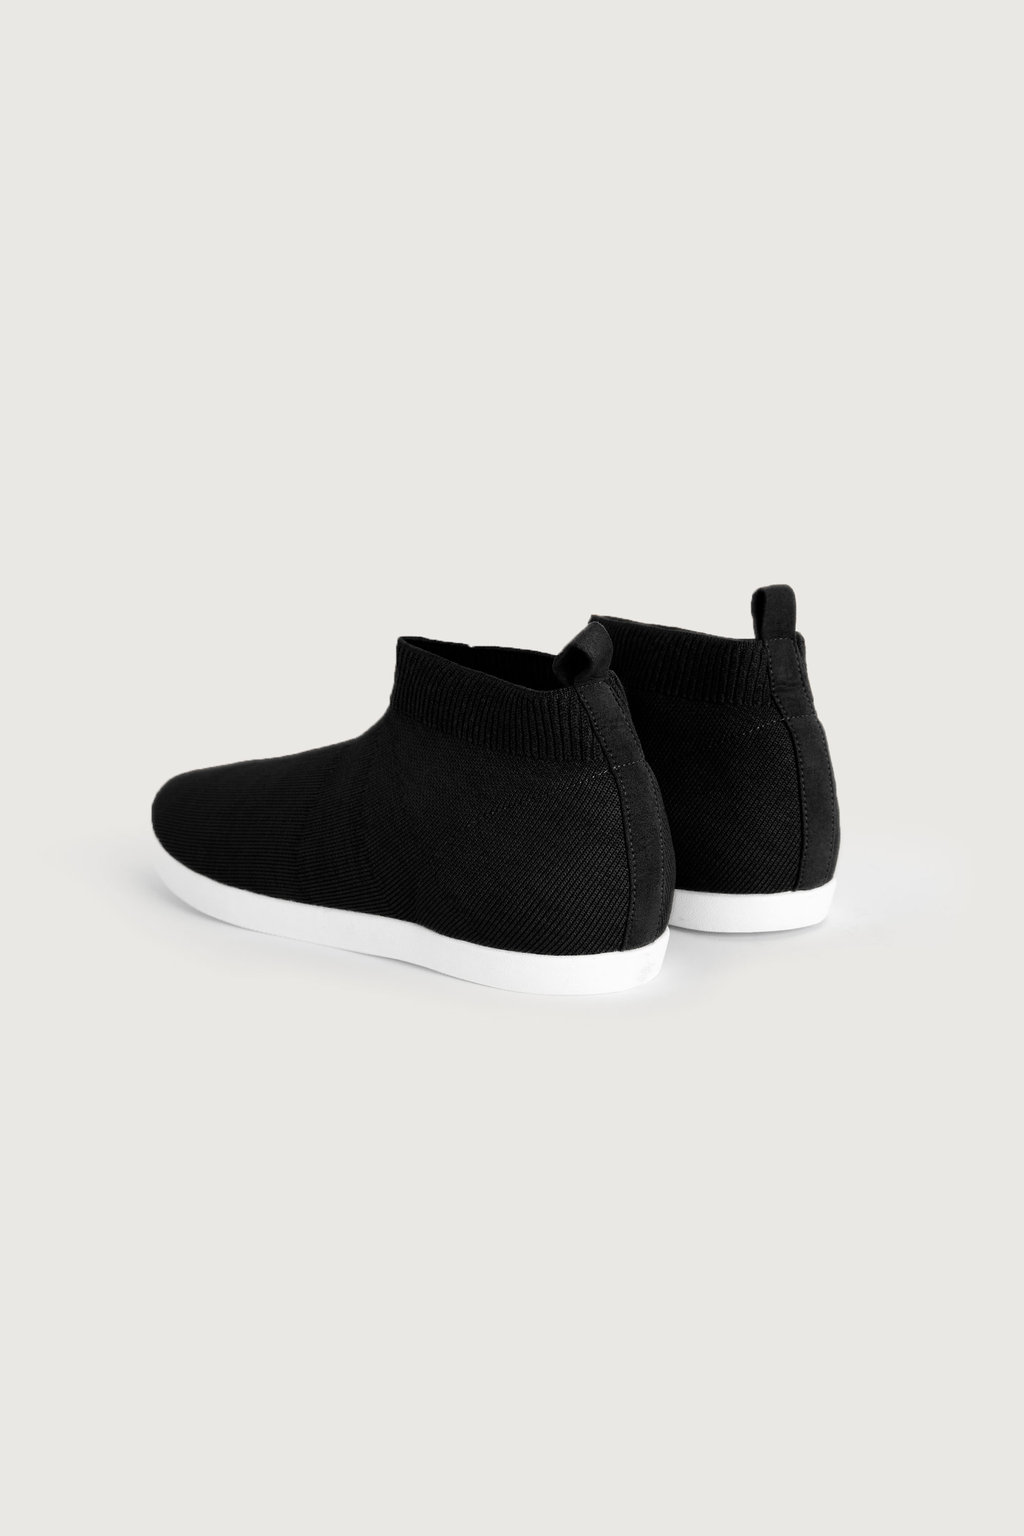 Sneaker 3334 Black 13